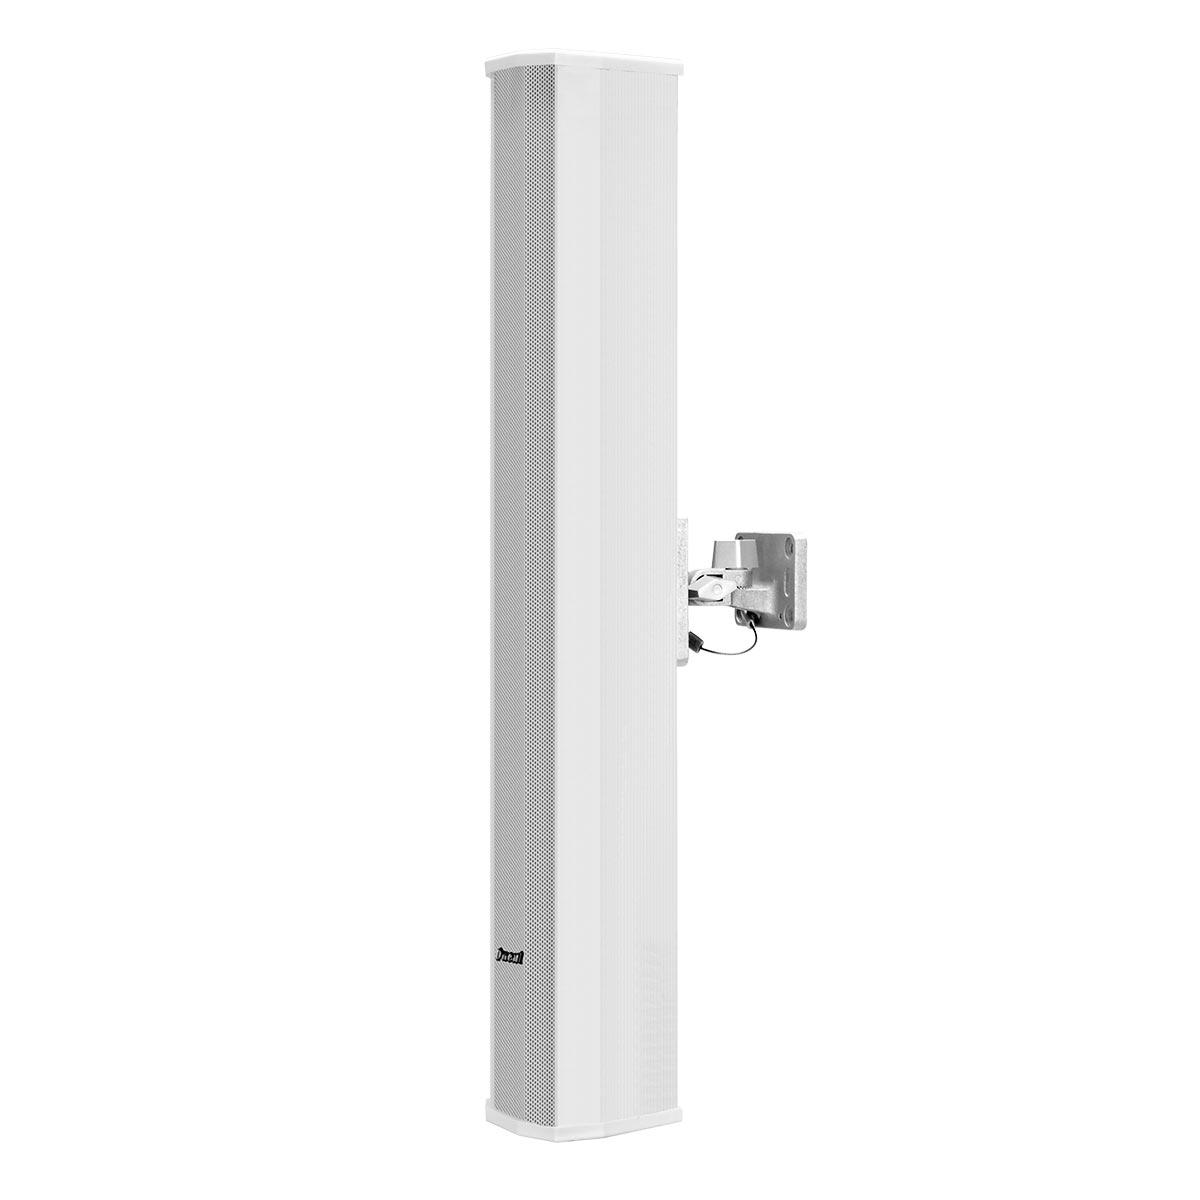 Caixa Passiva Vertical Array 300W OLB 1202 Branca - Oneal